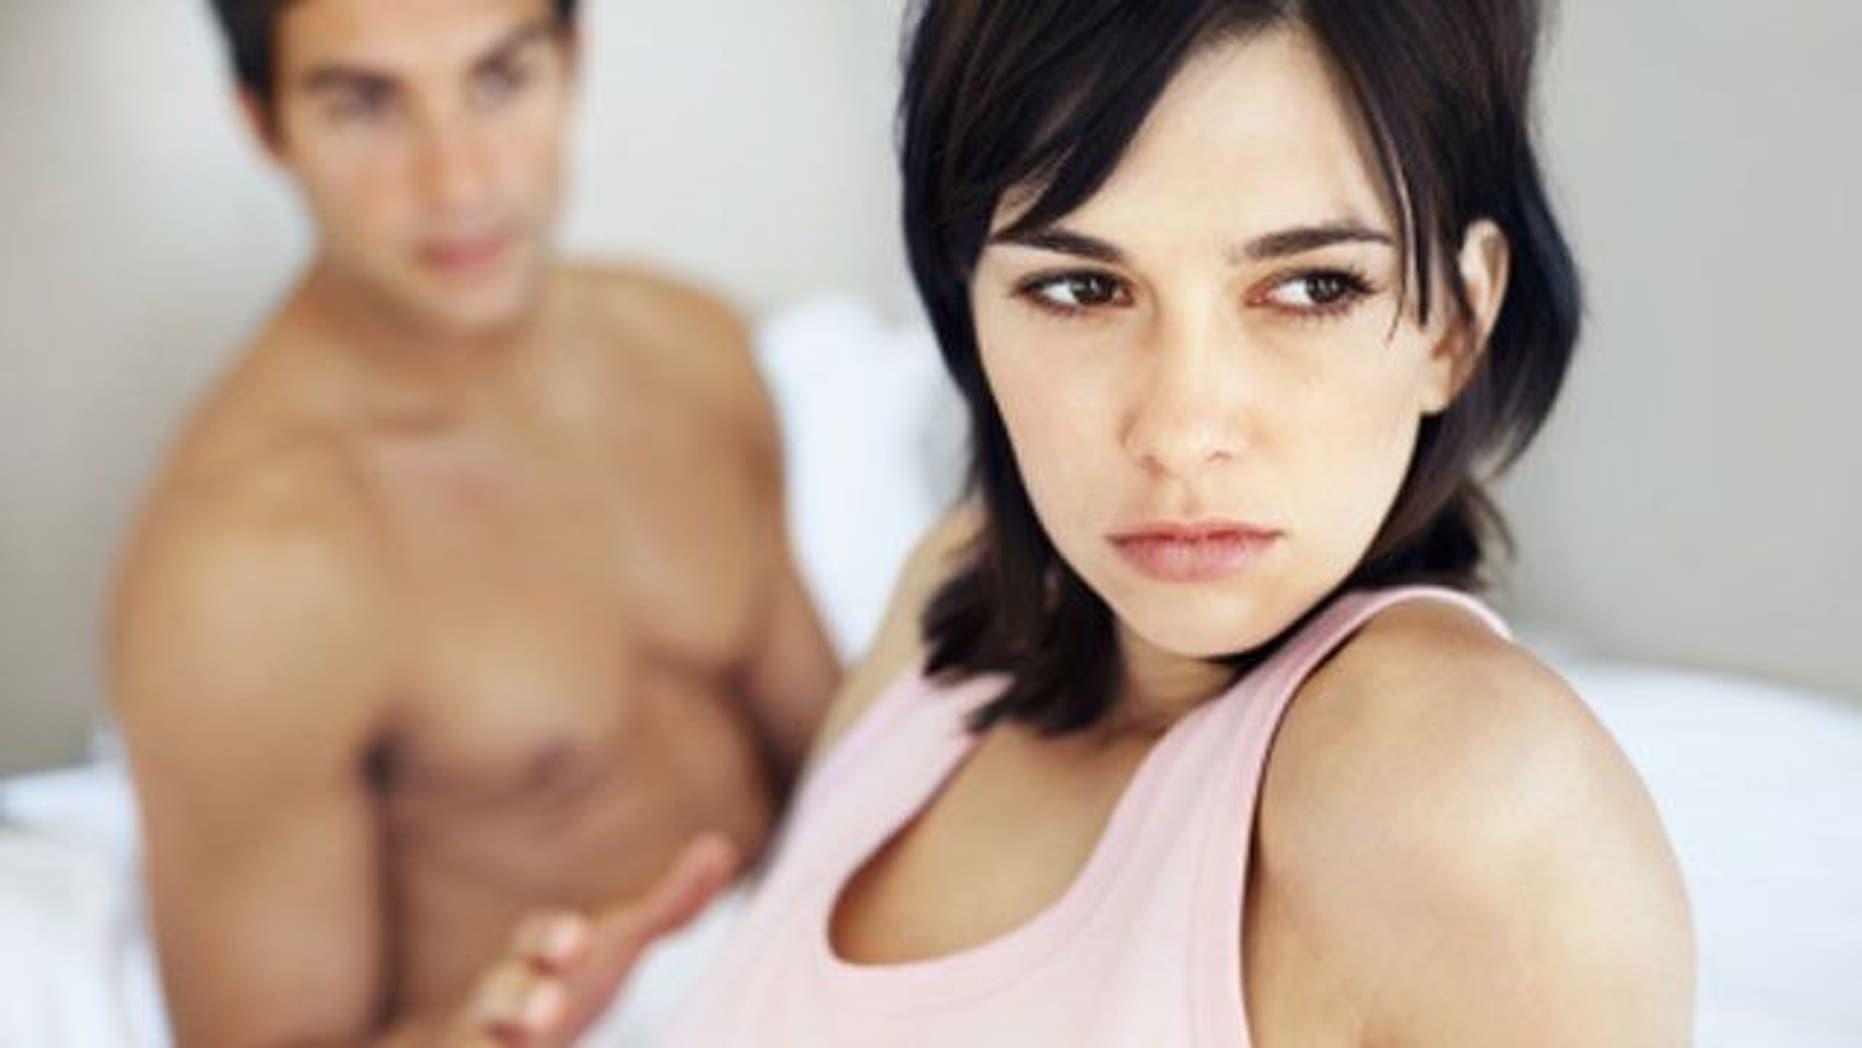 Sex 2 3 times per year abnormal